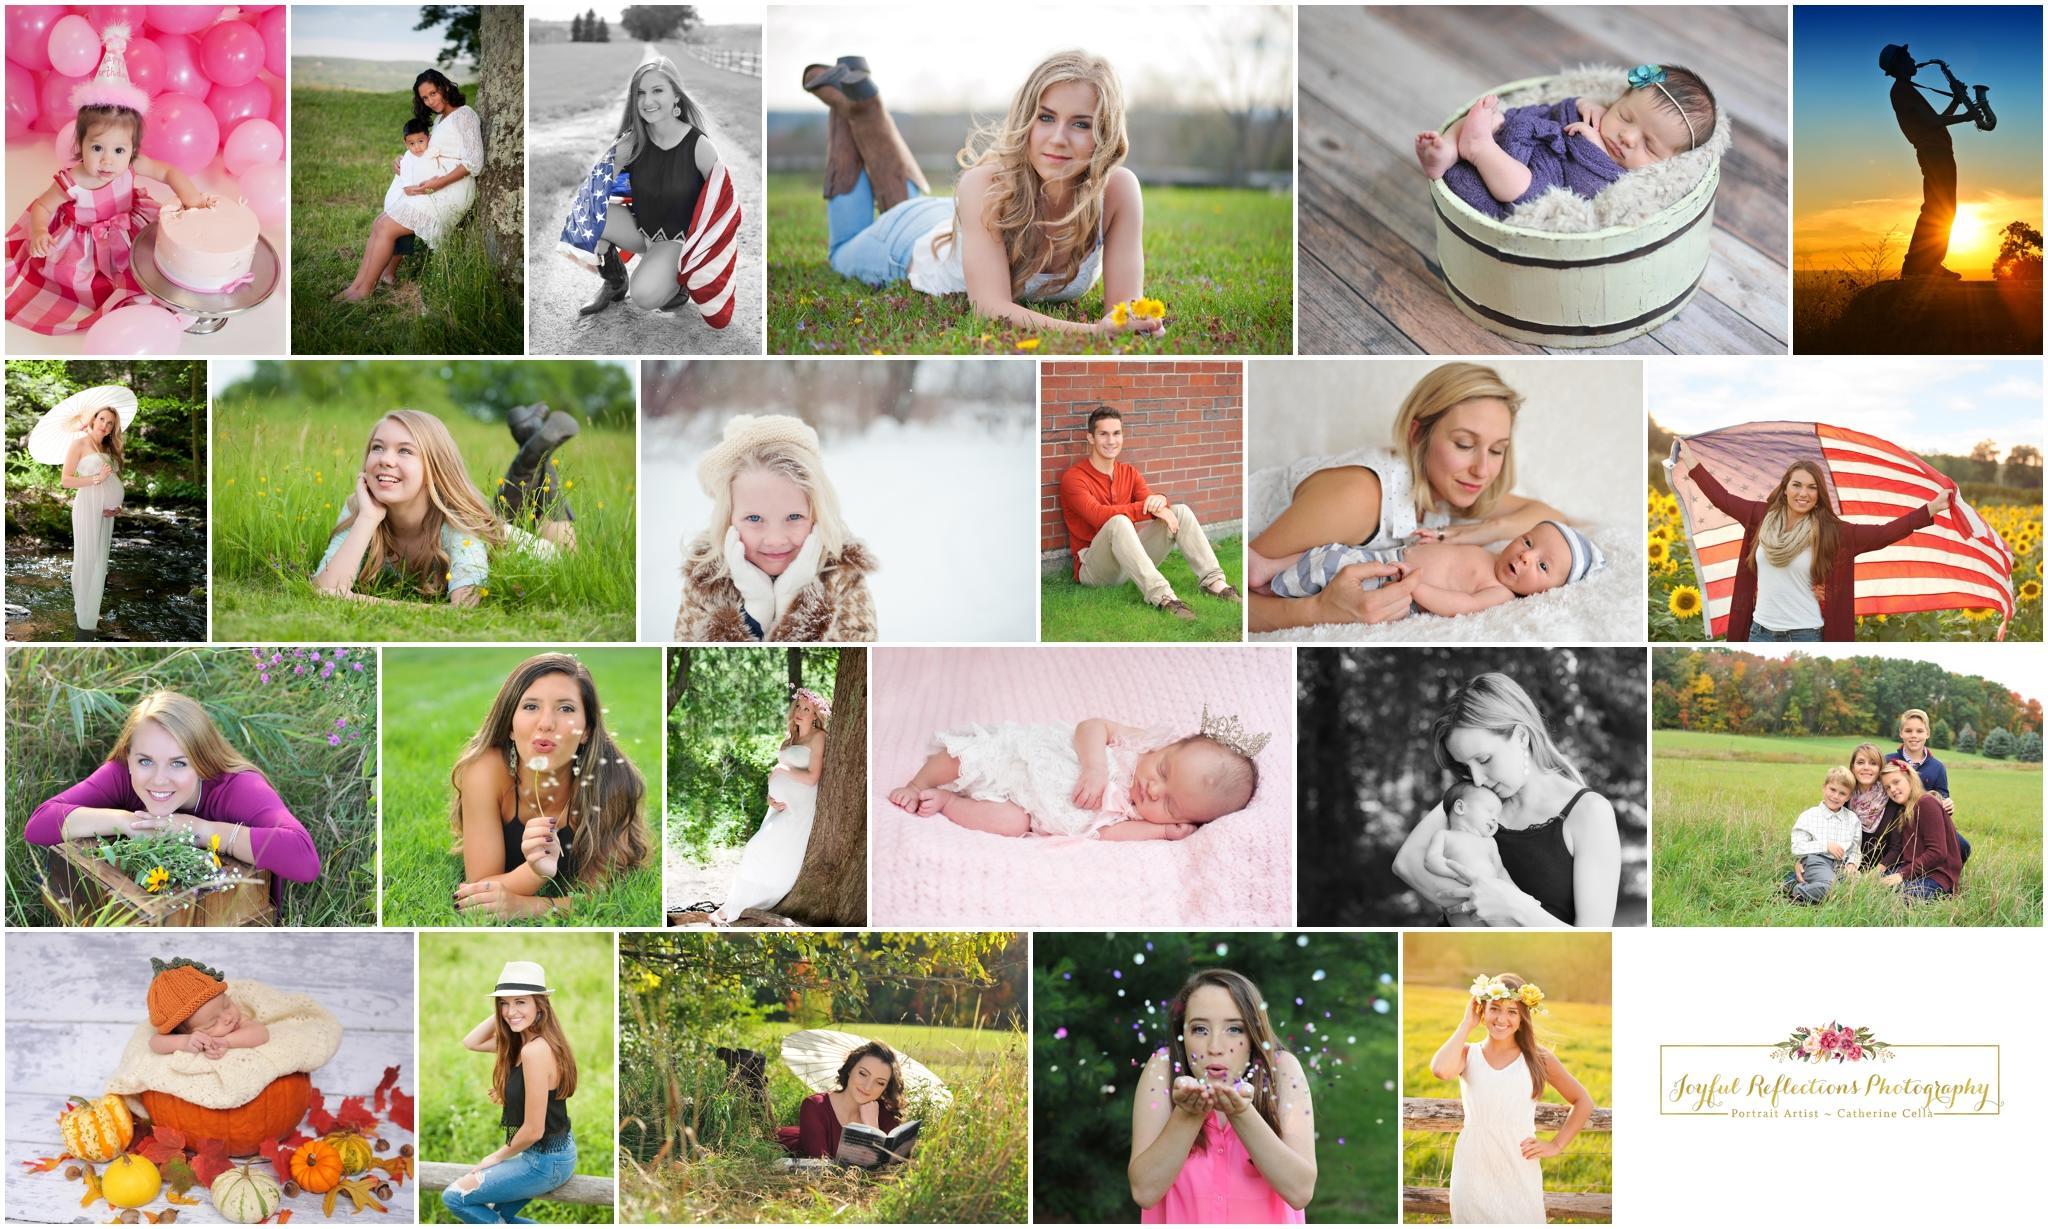 Catherine Cella of Joyful Reflections Photography. Family, Seniors, baby's, maternity, and newborns   http://joyfulreflectionsphotography.com/